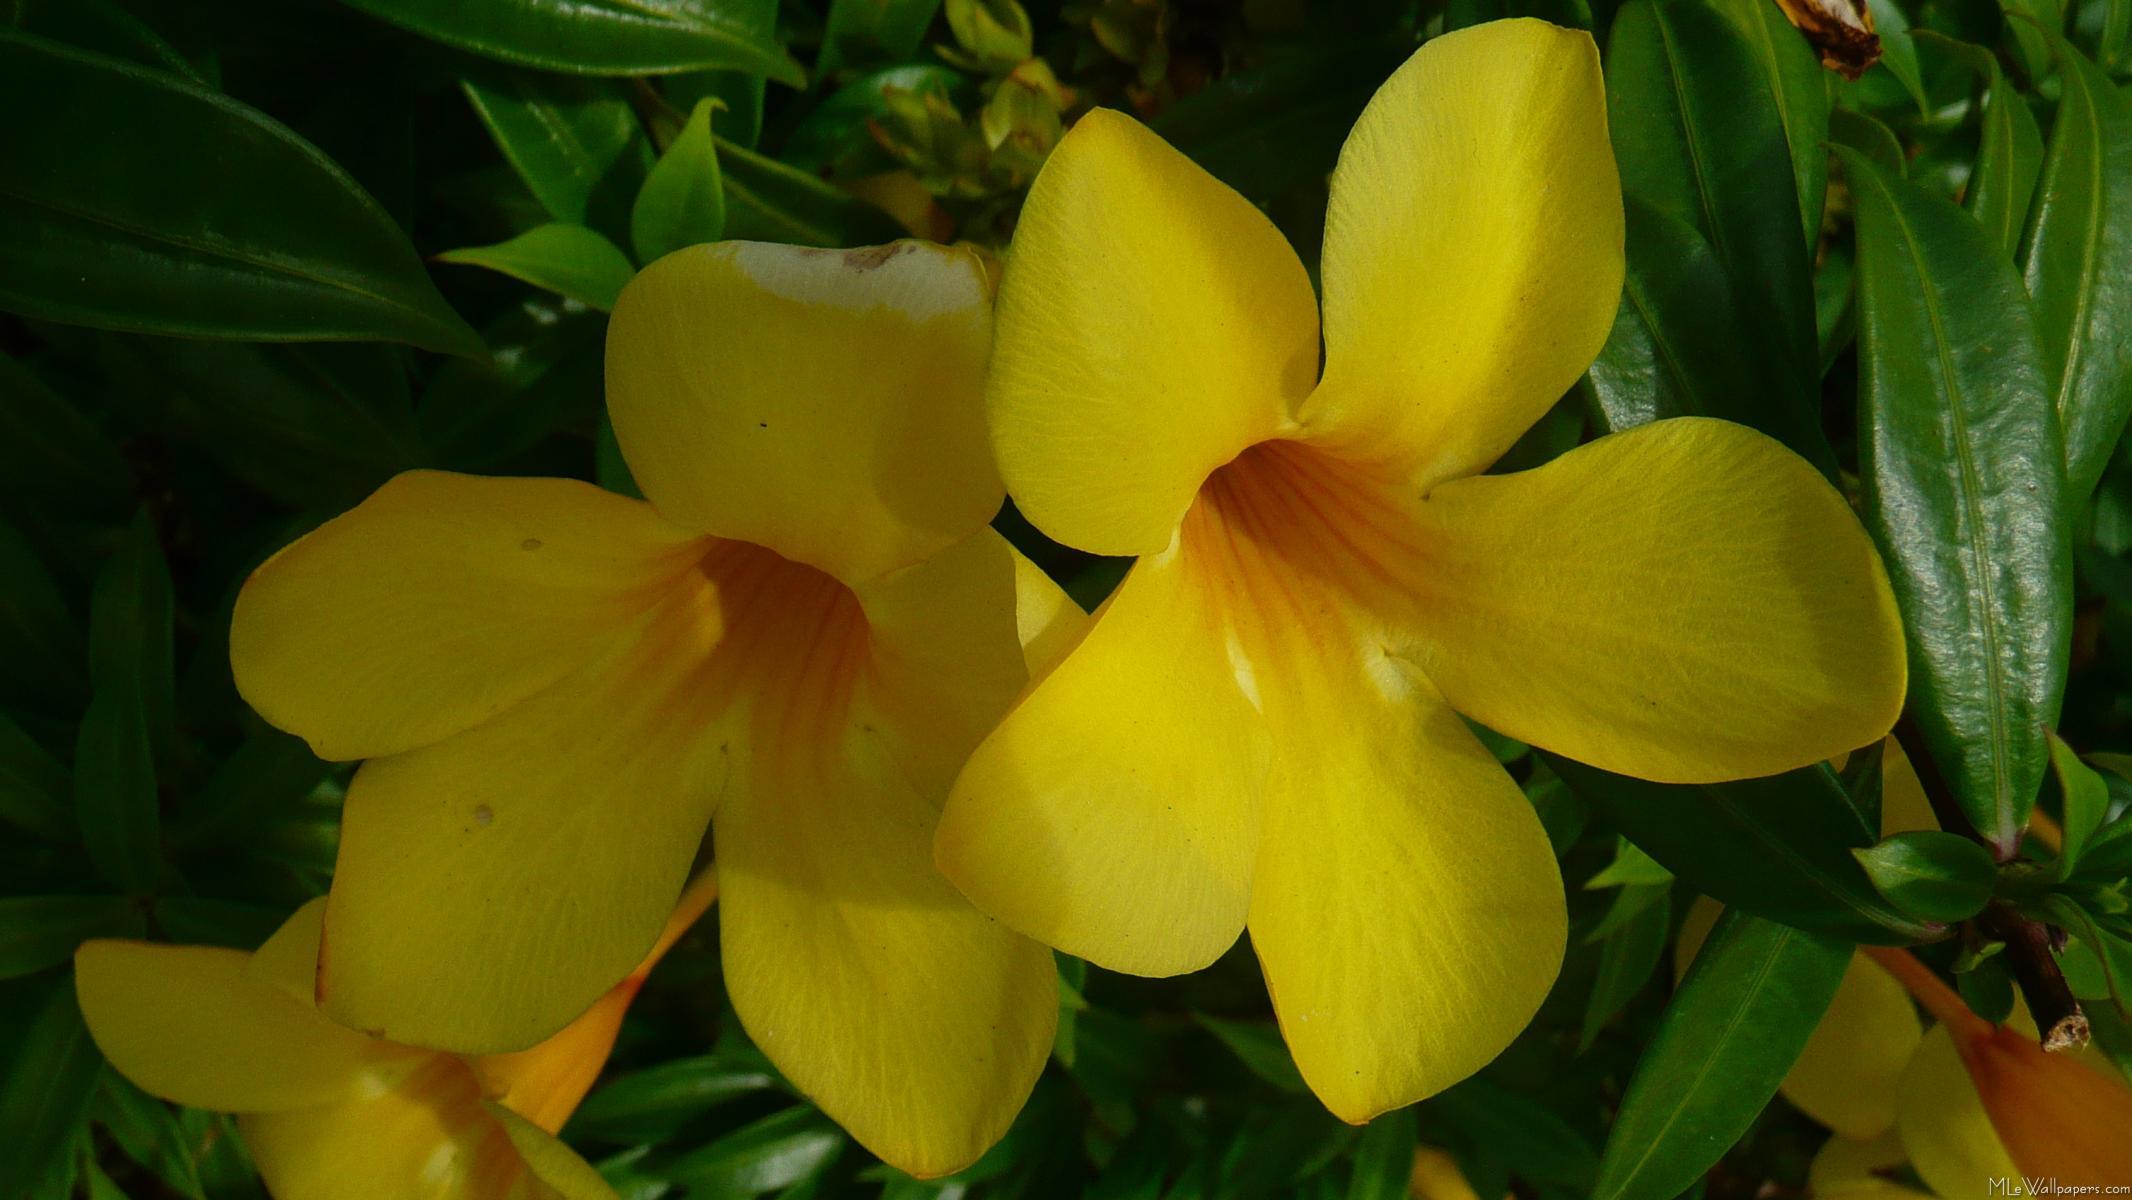 mlewallpapers  golden trumpet flowers ii, Beautiful flower